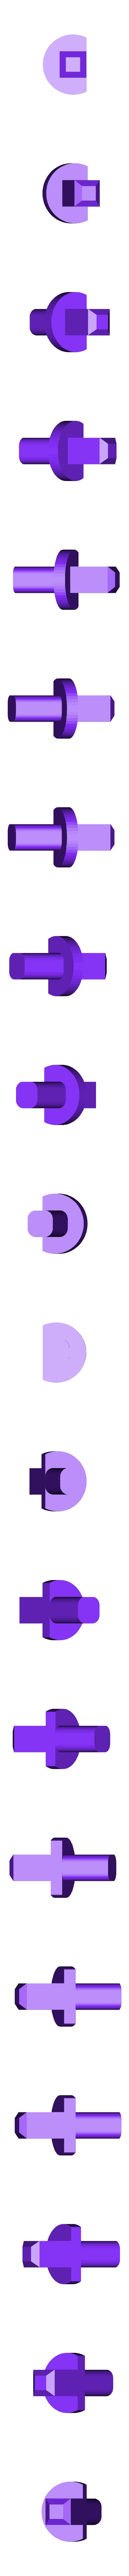 Bottom_Adaptor.stl Download free STL file Archimedes Screw Bonanza • 3D printer design, Urulysman